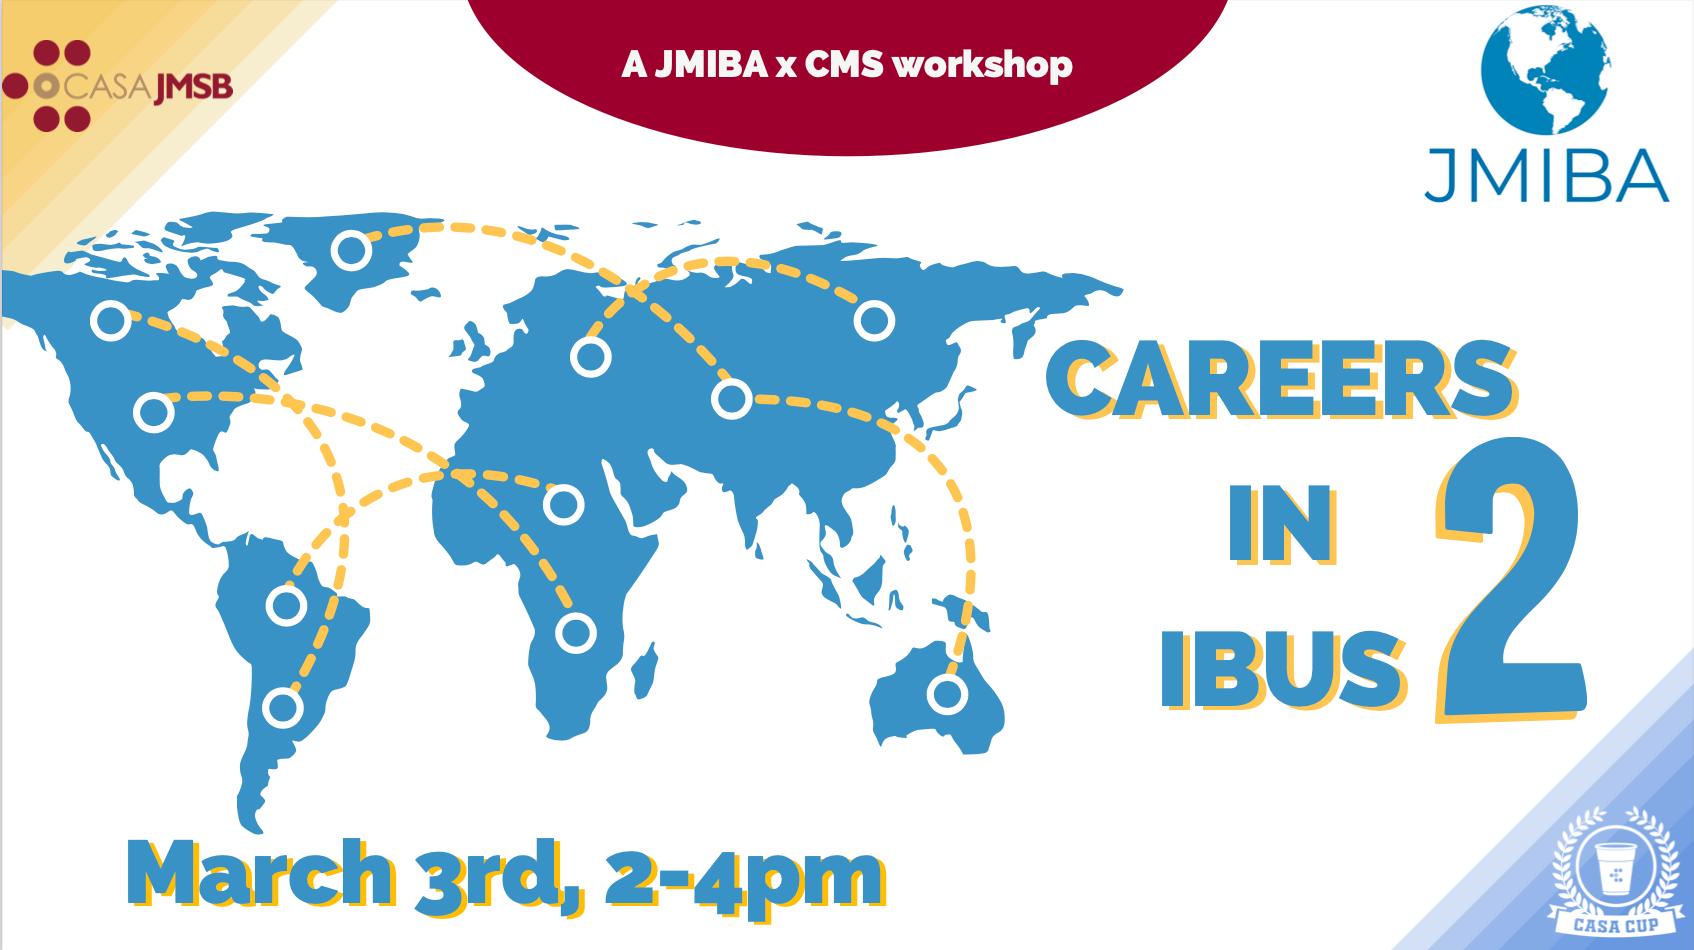 Careers in IBUS 2.png